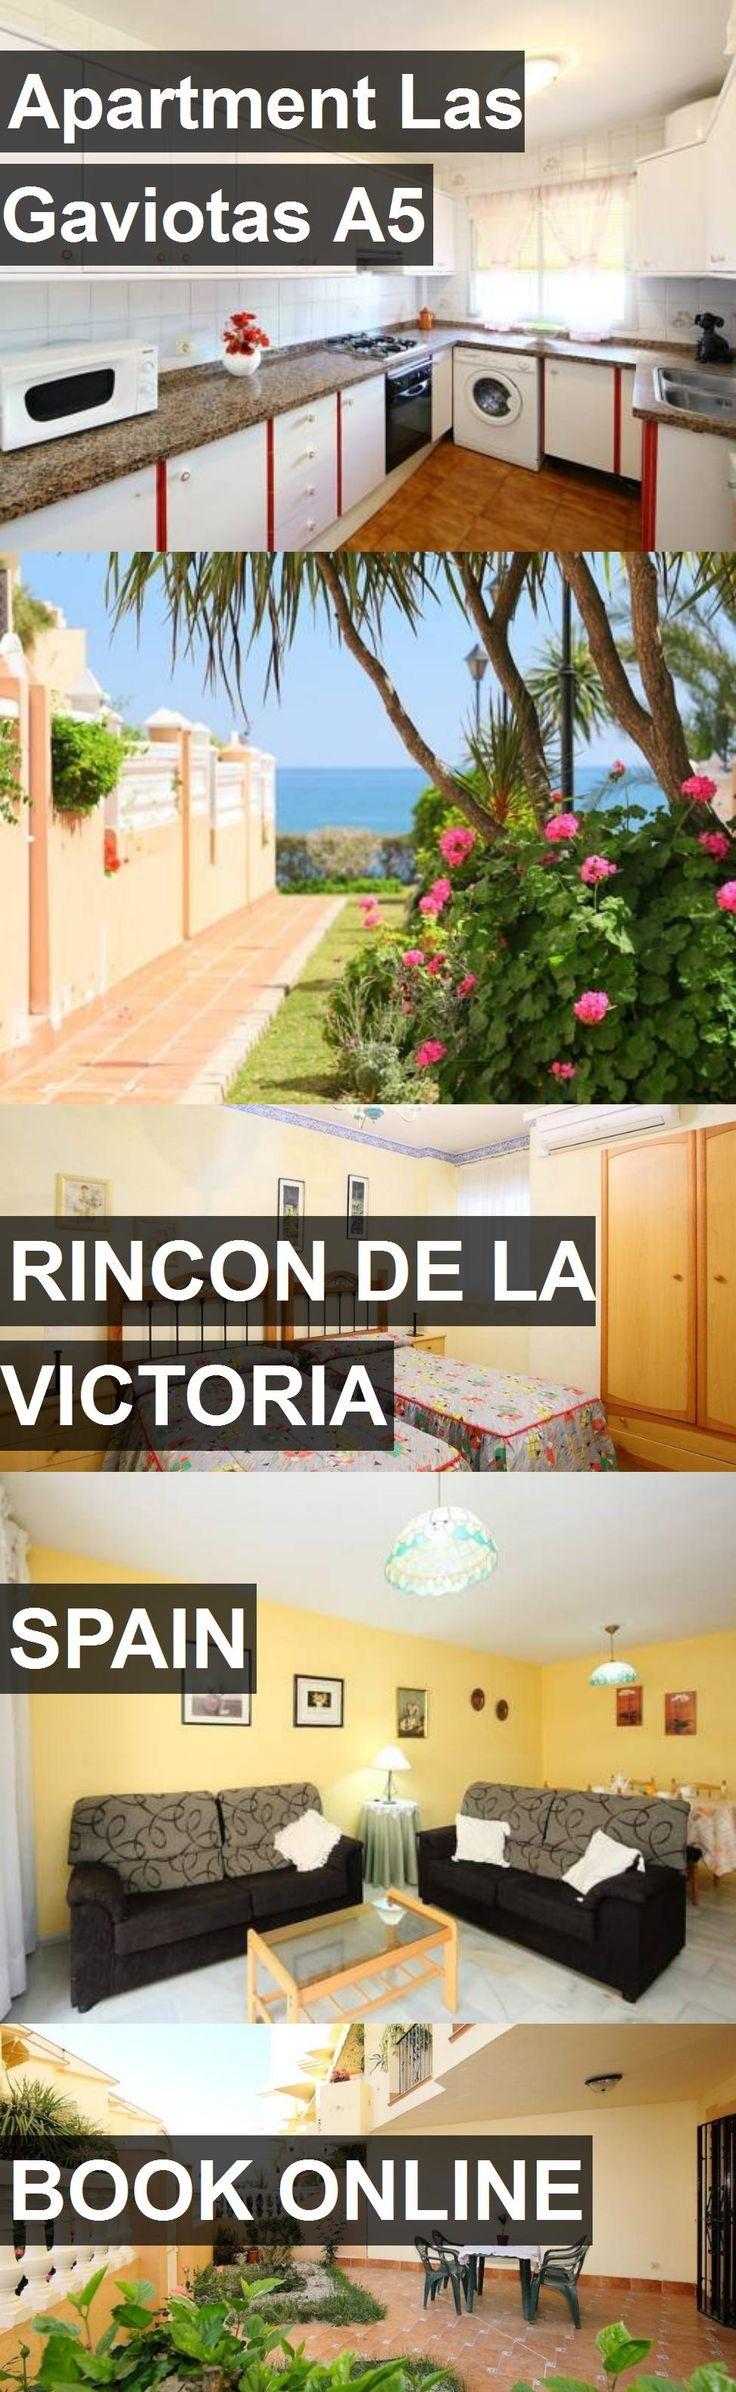 Hotel Apartment Las Gaviotas A5 in Rincon de la Victoria, Spain. For more information, photos, reviews and best prices please follow the link. #Spain #RincondelaVictoria #ApartmentLasGaviotasA5 #hotel #travel #vacation